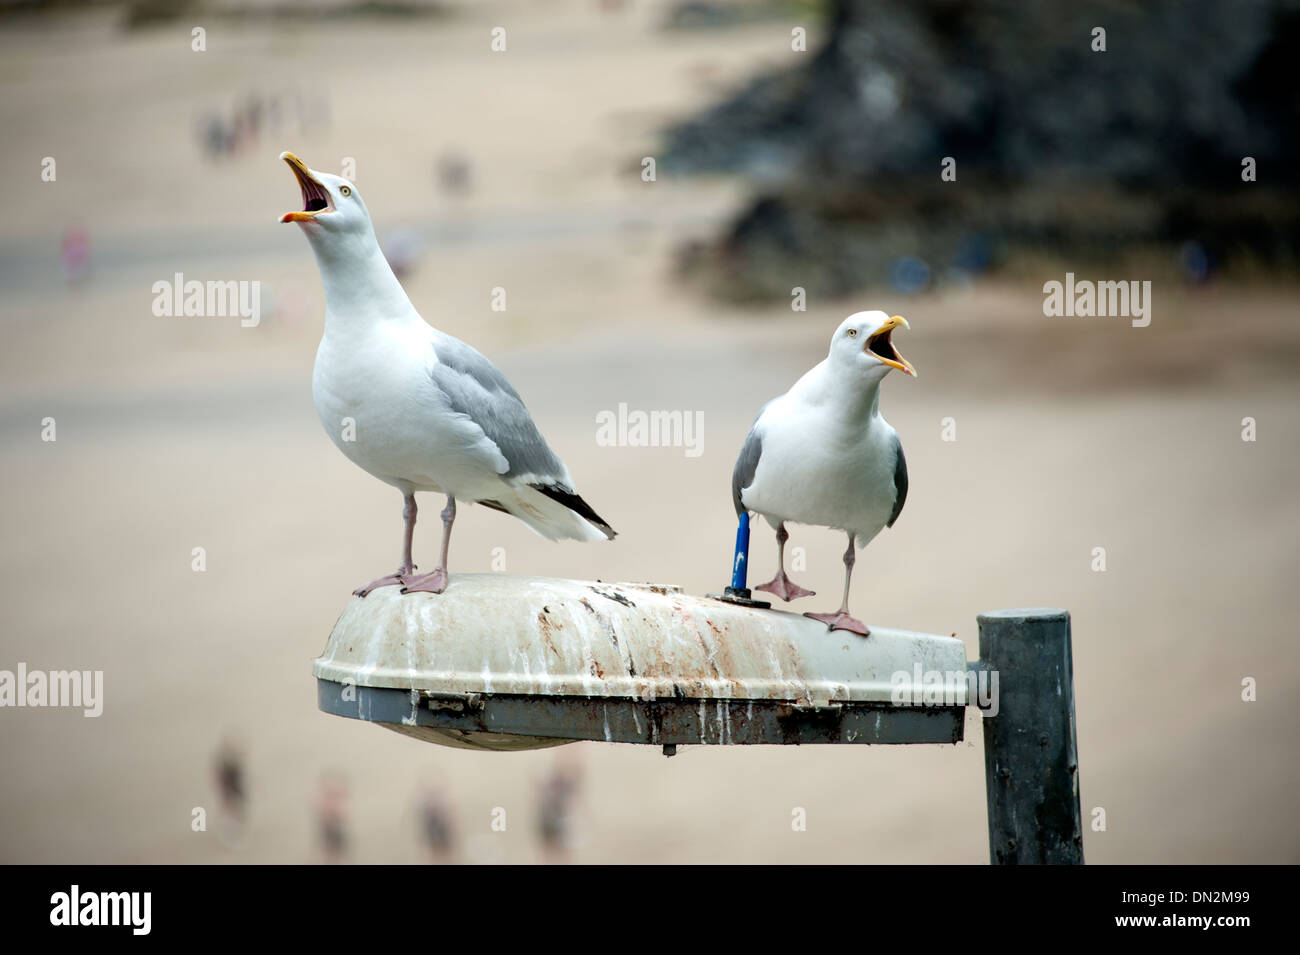 Seagulls on street lamp poo mess dirty soiled bird - Stock Image